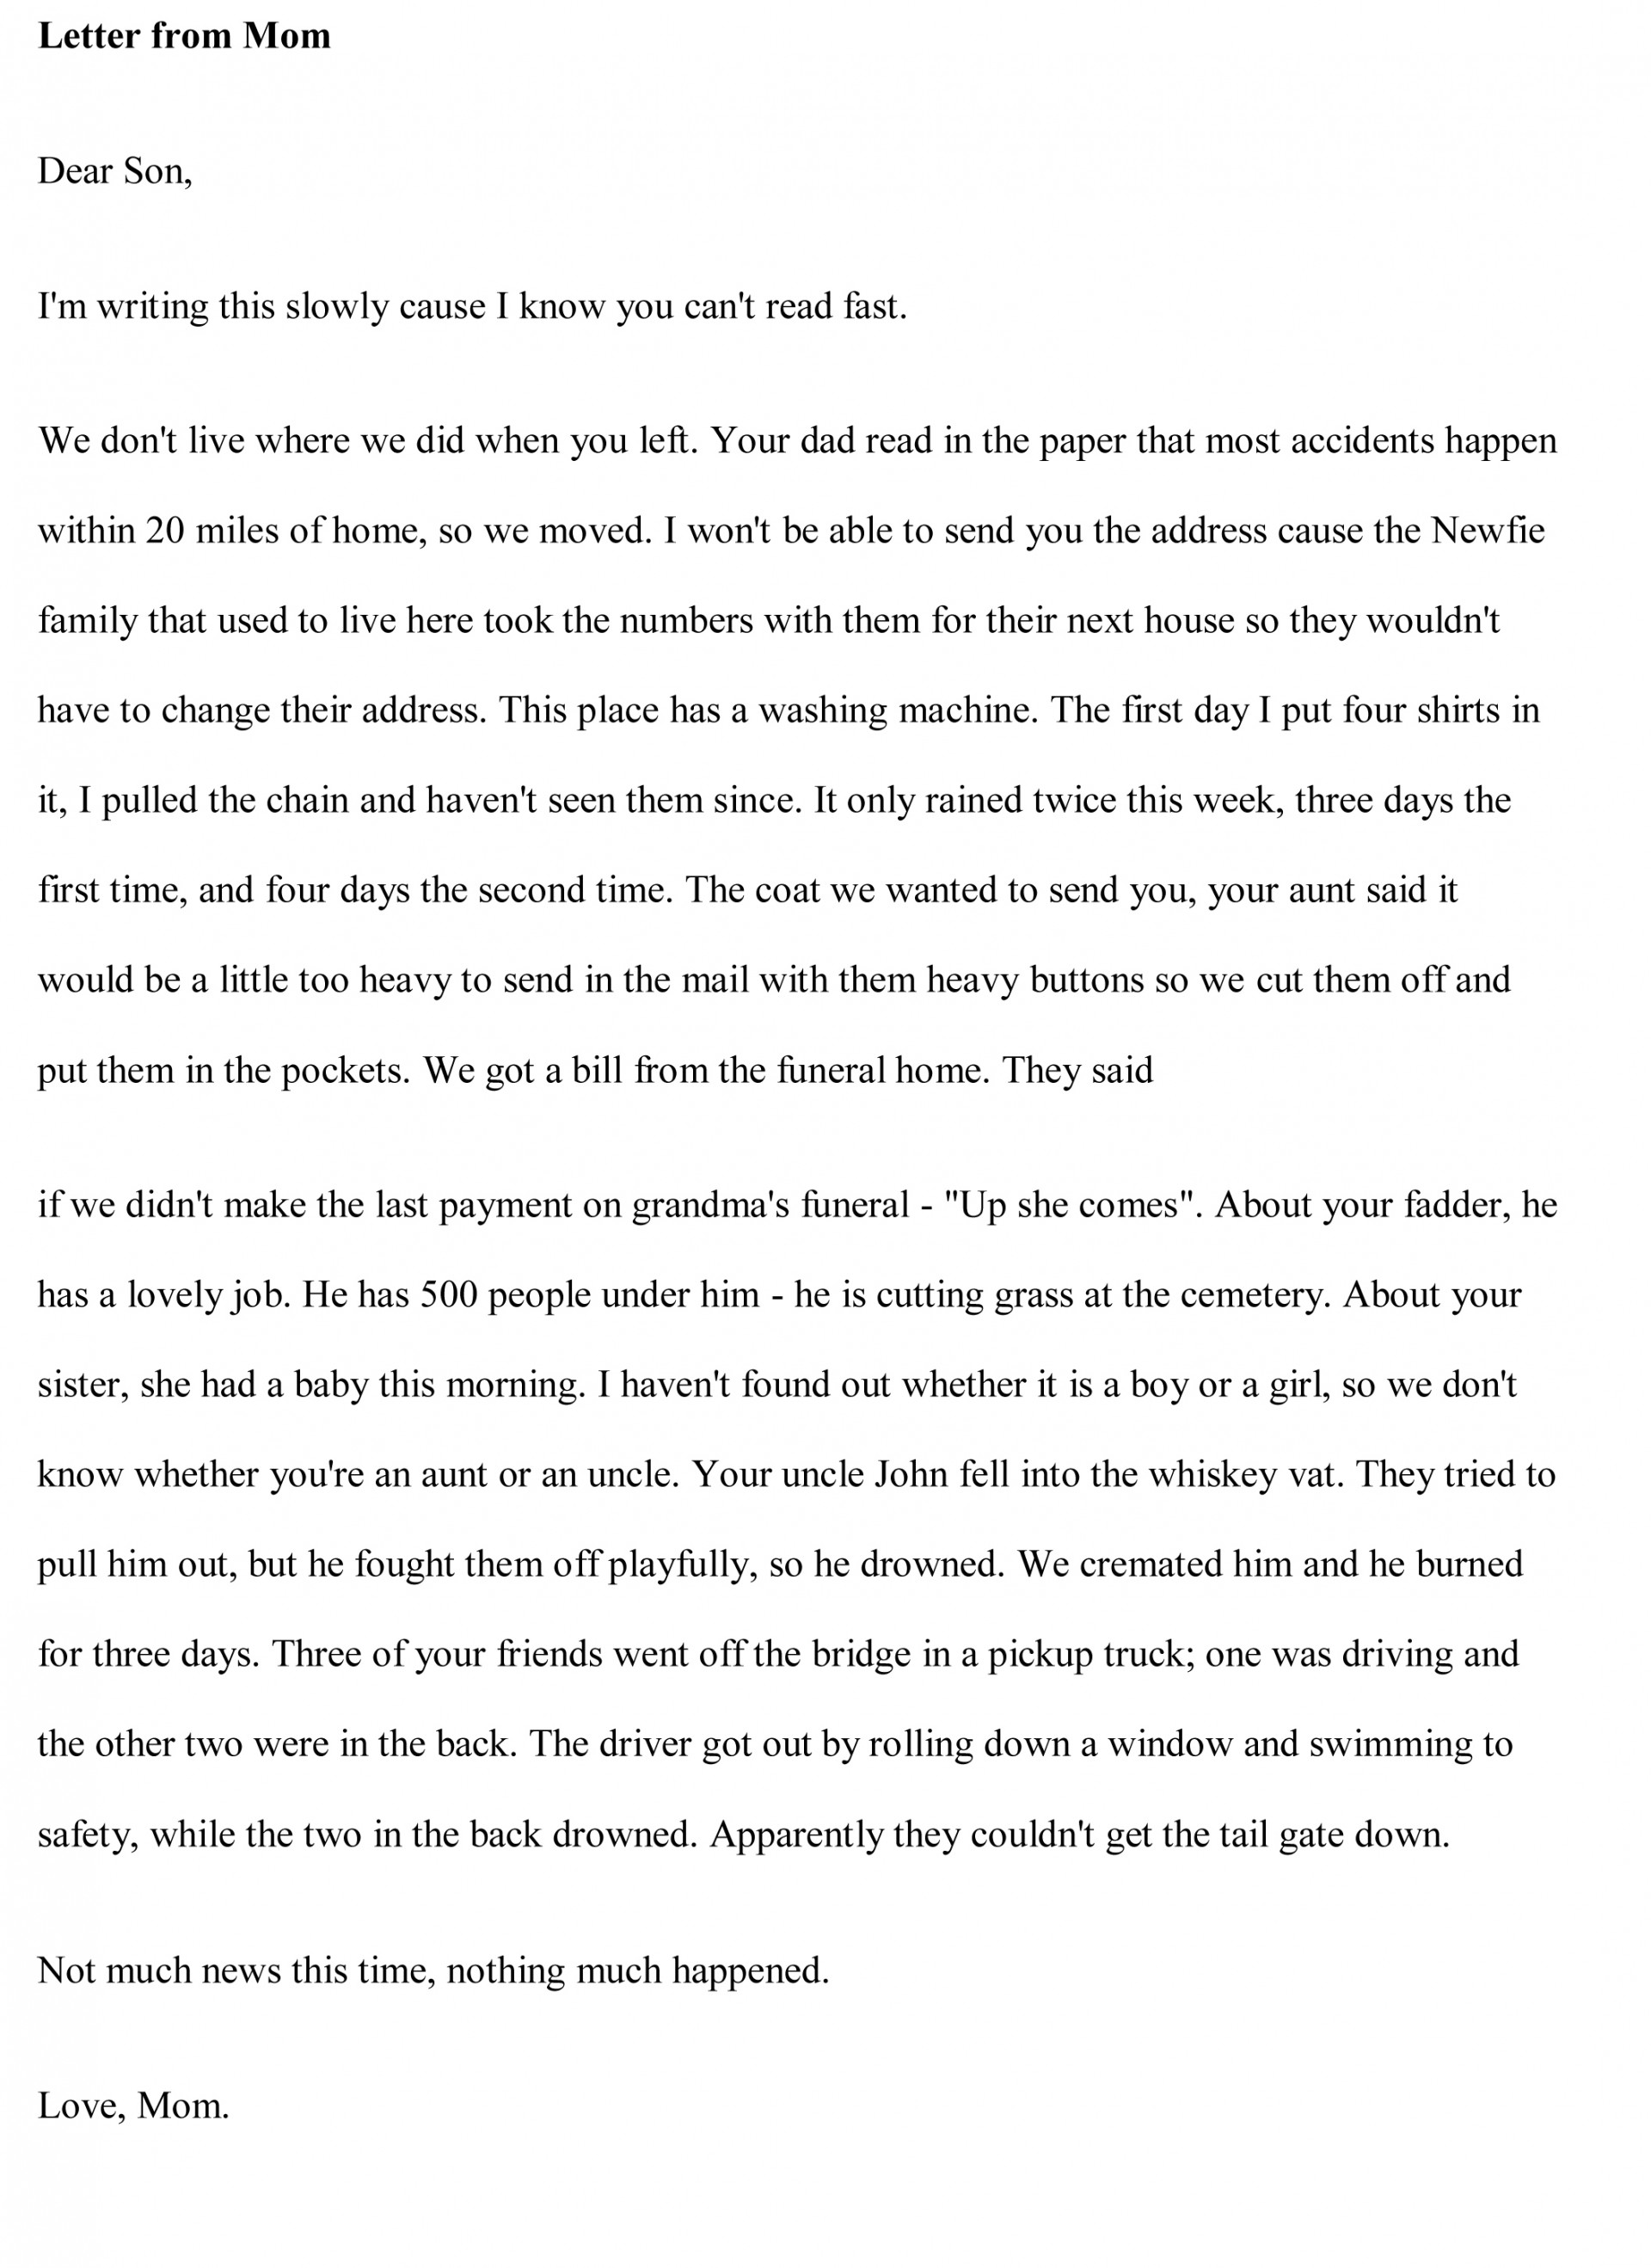 013 Essay Example Funny Free Sample Persuasive Excellent College Level Pdf 1920